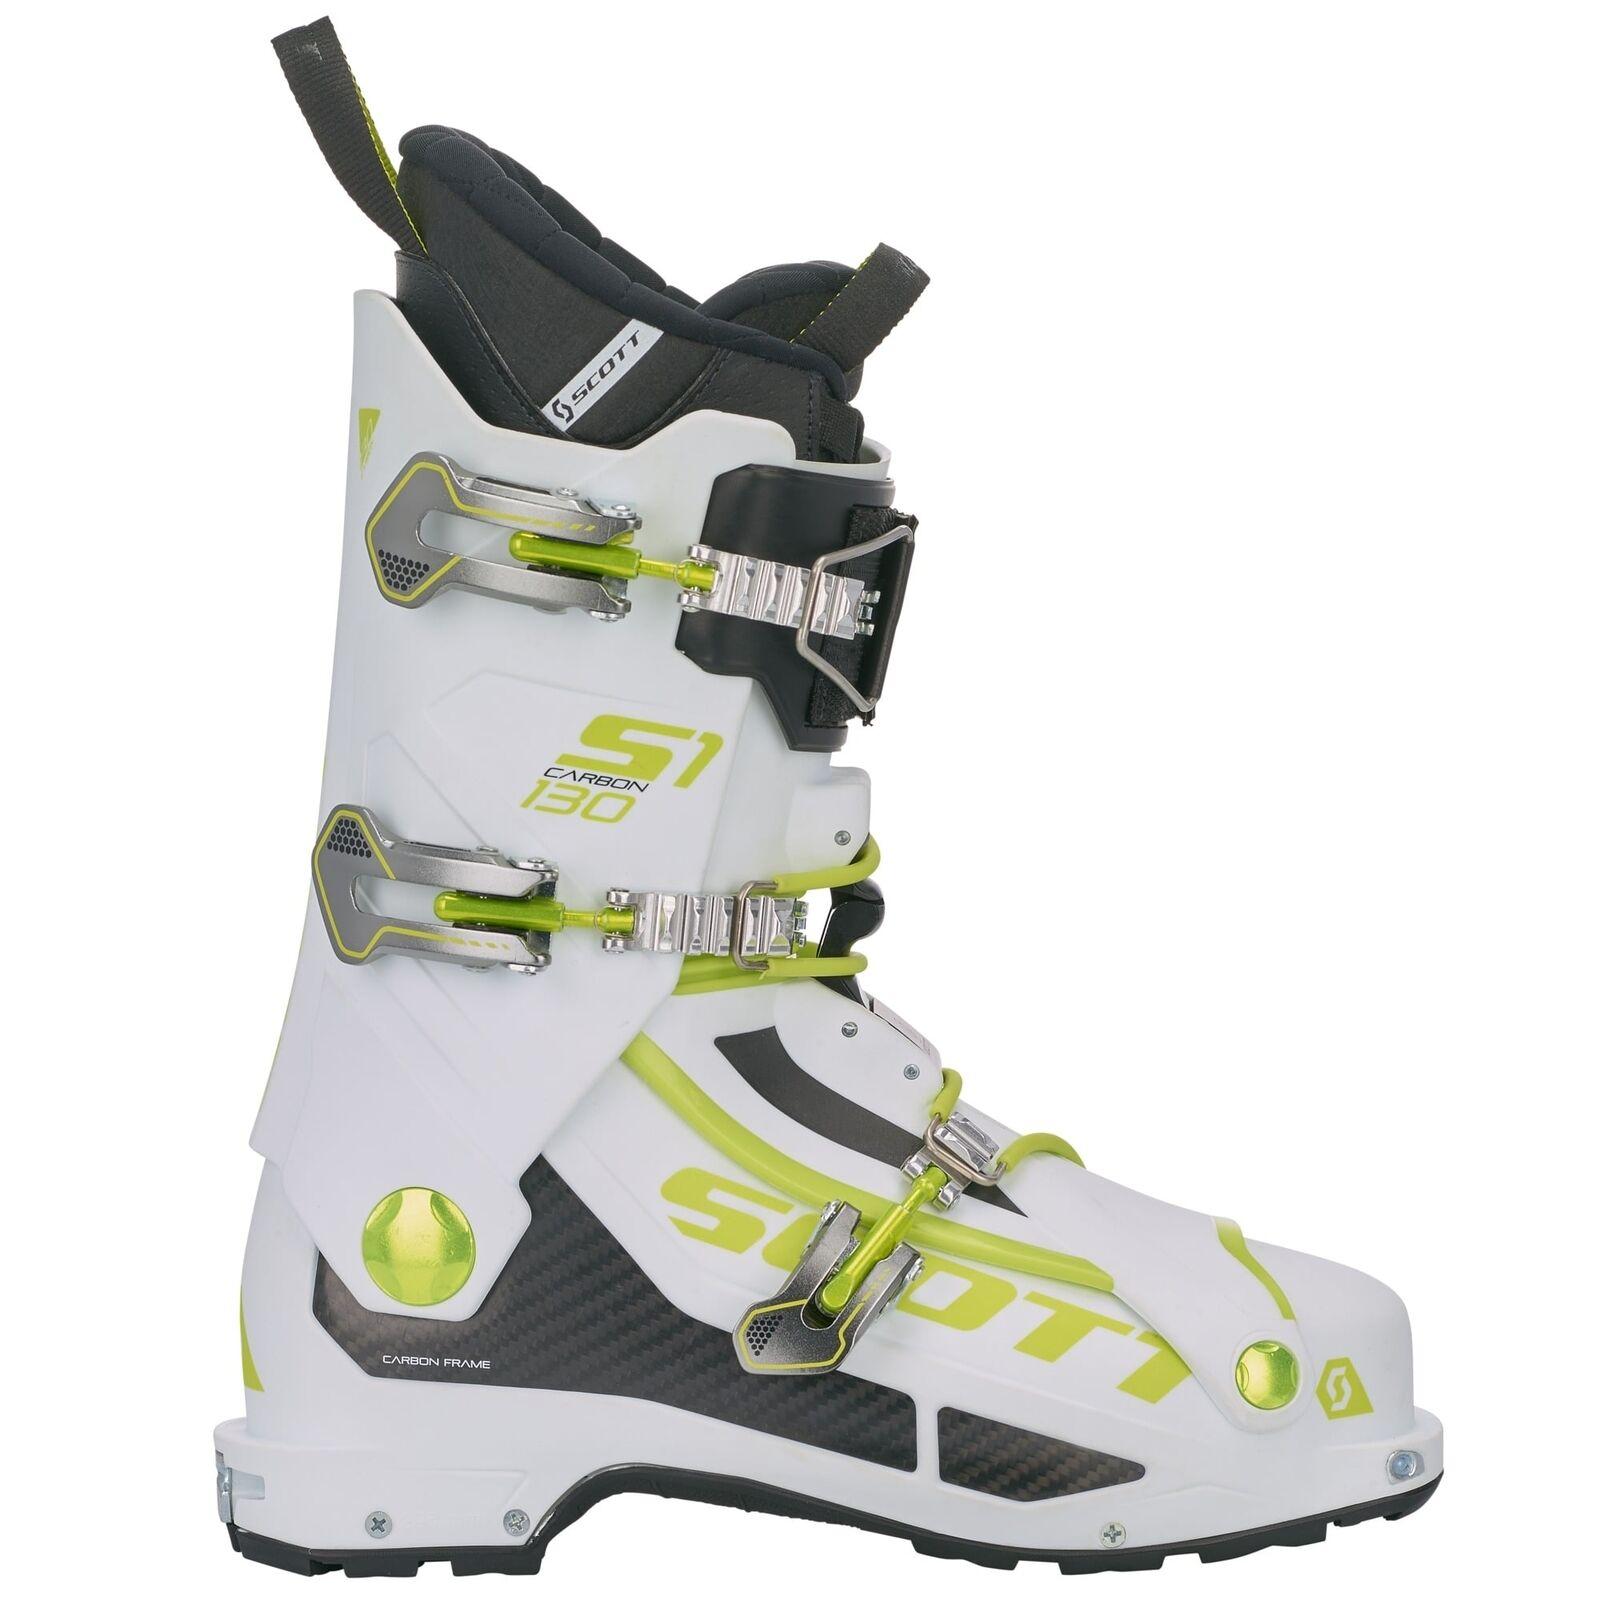 Ski Touring Scott S1 Carbon Touring Boot